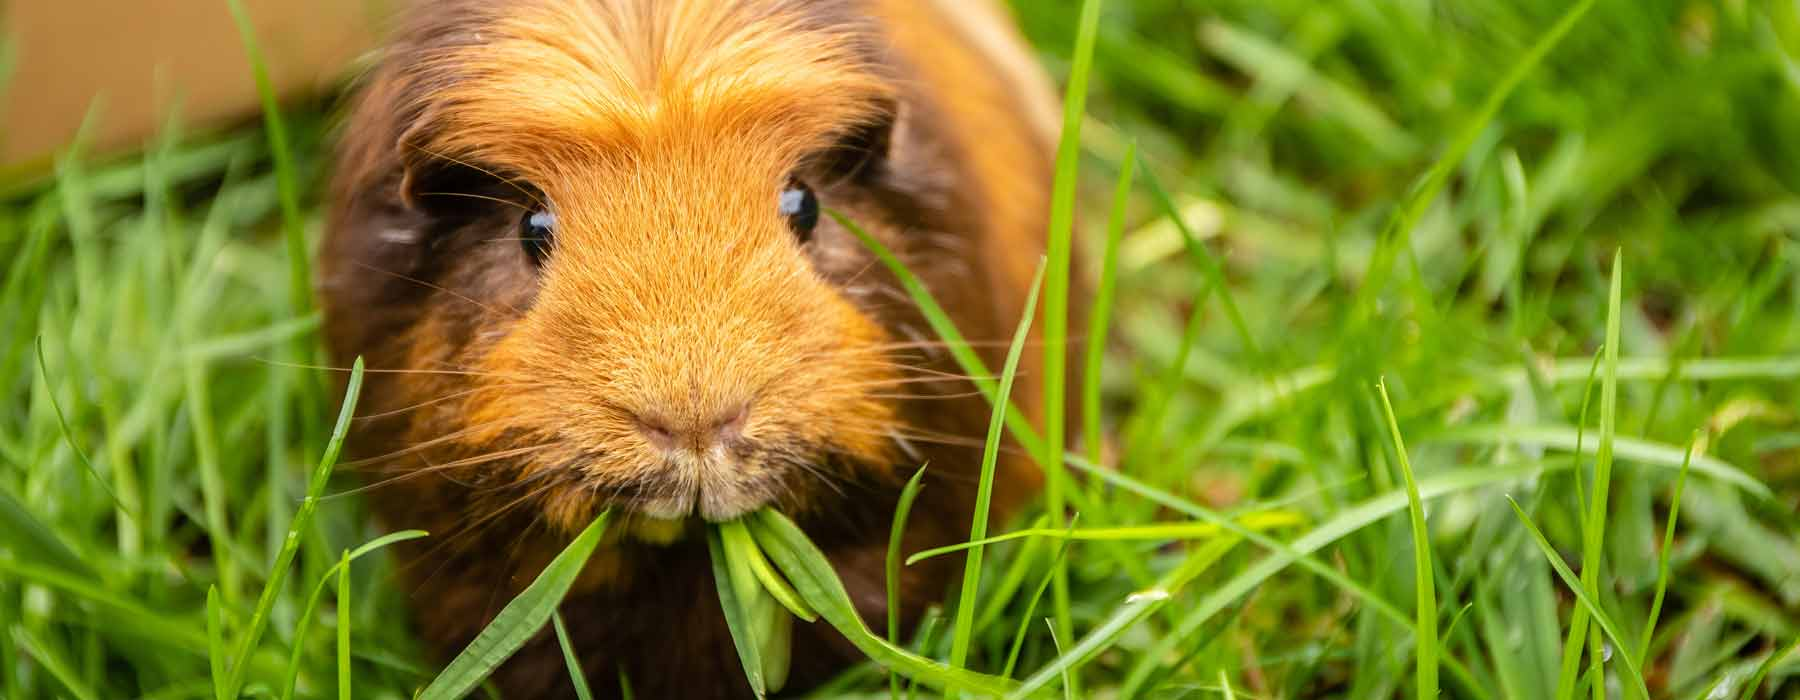 ginger guinea pig outdoors eating grass